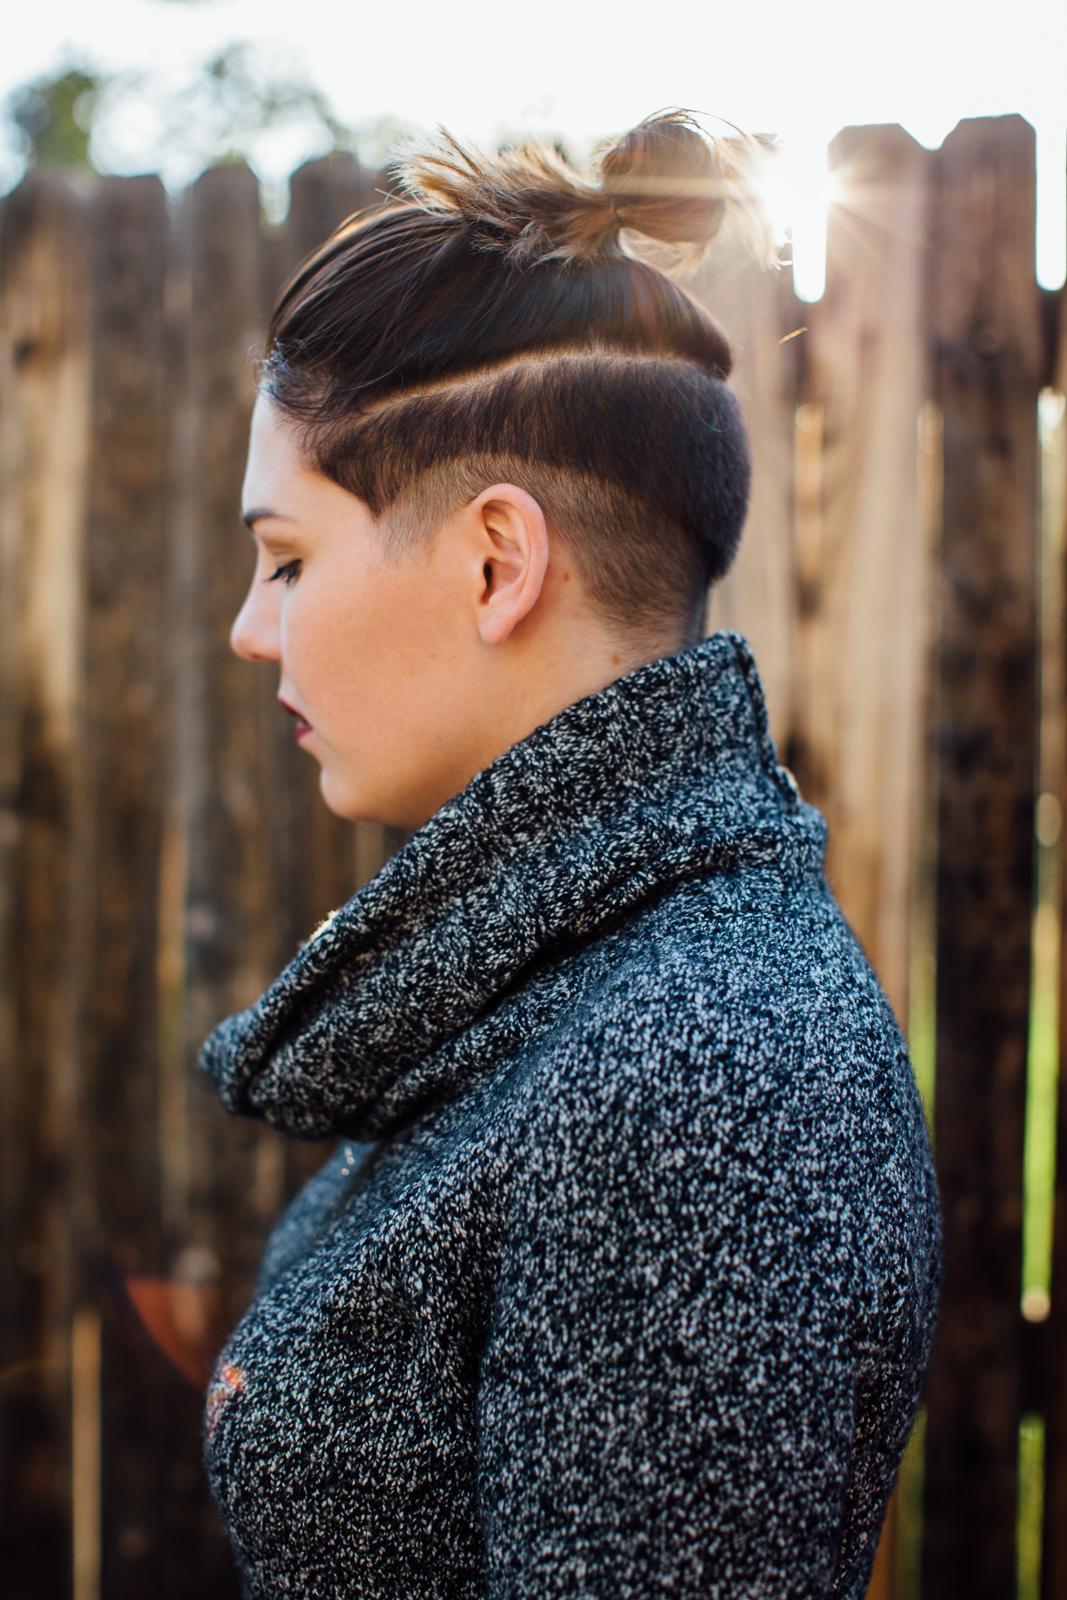 Hairstylist: Jennifer Cummins of Stranz Salon